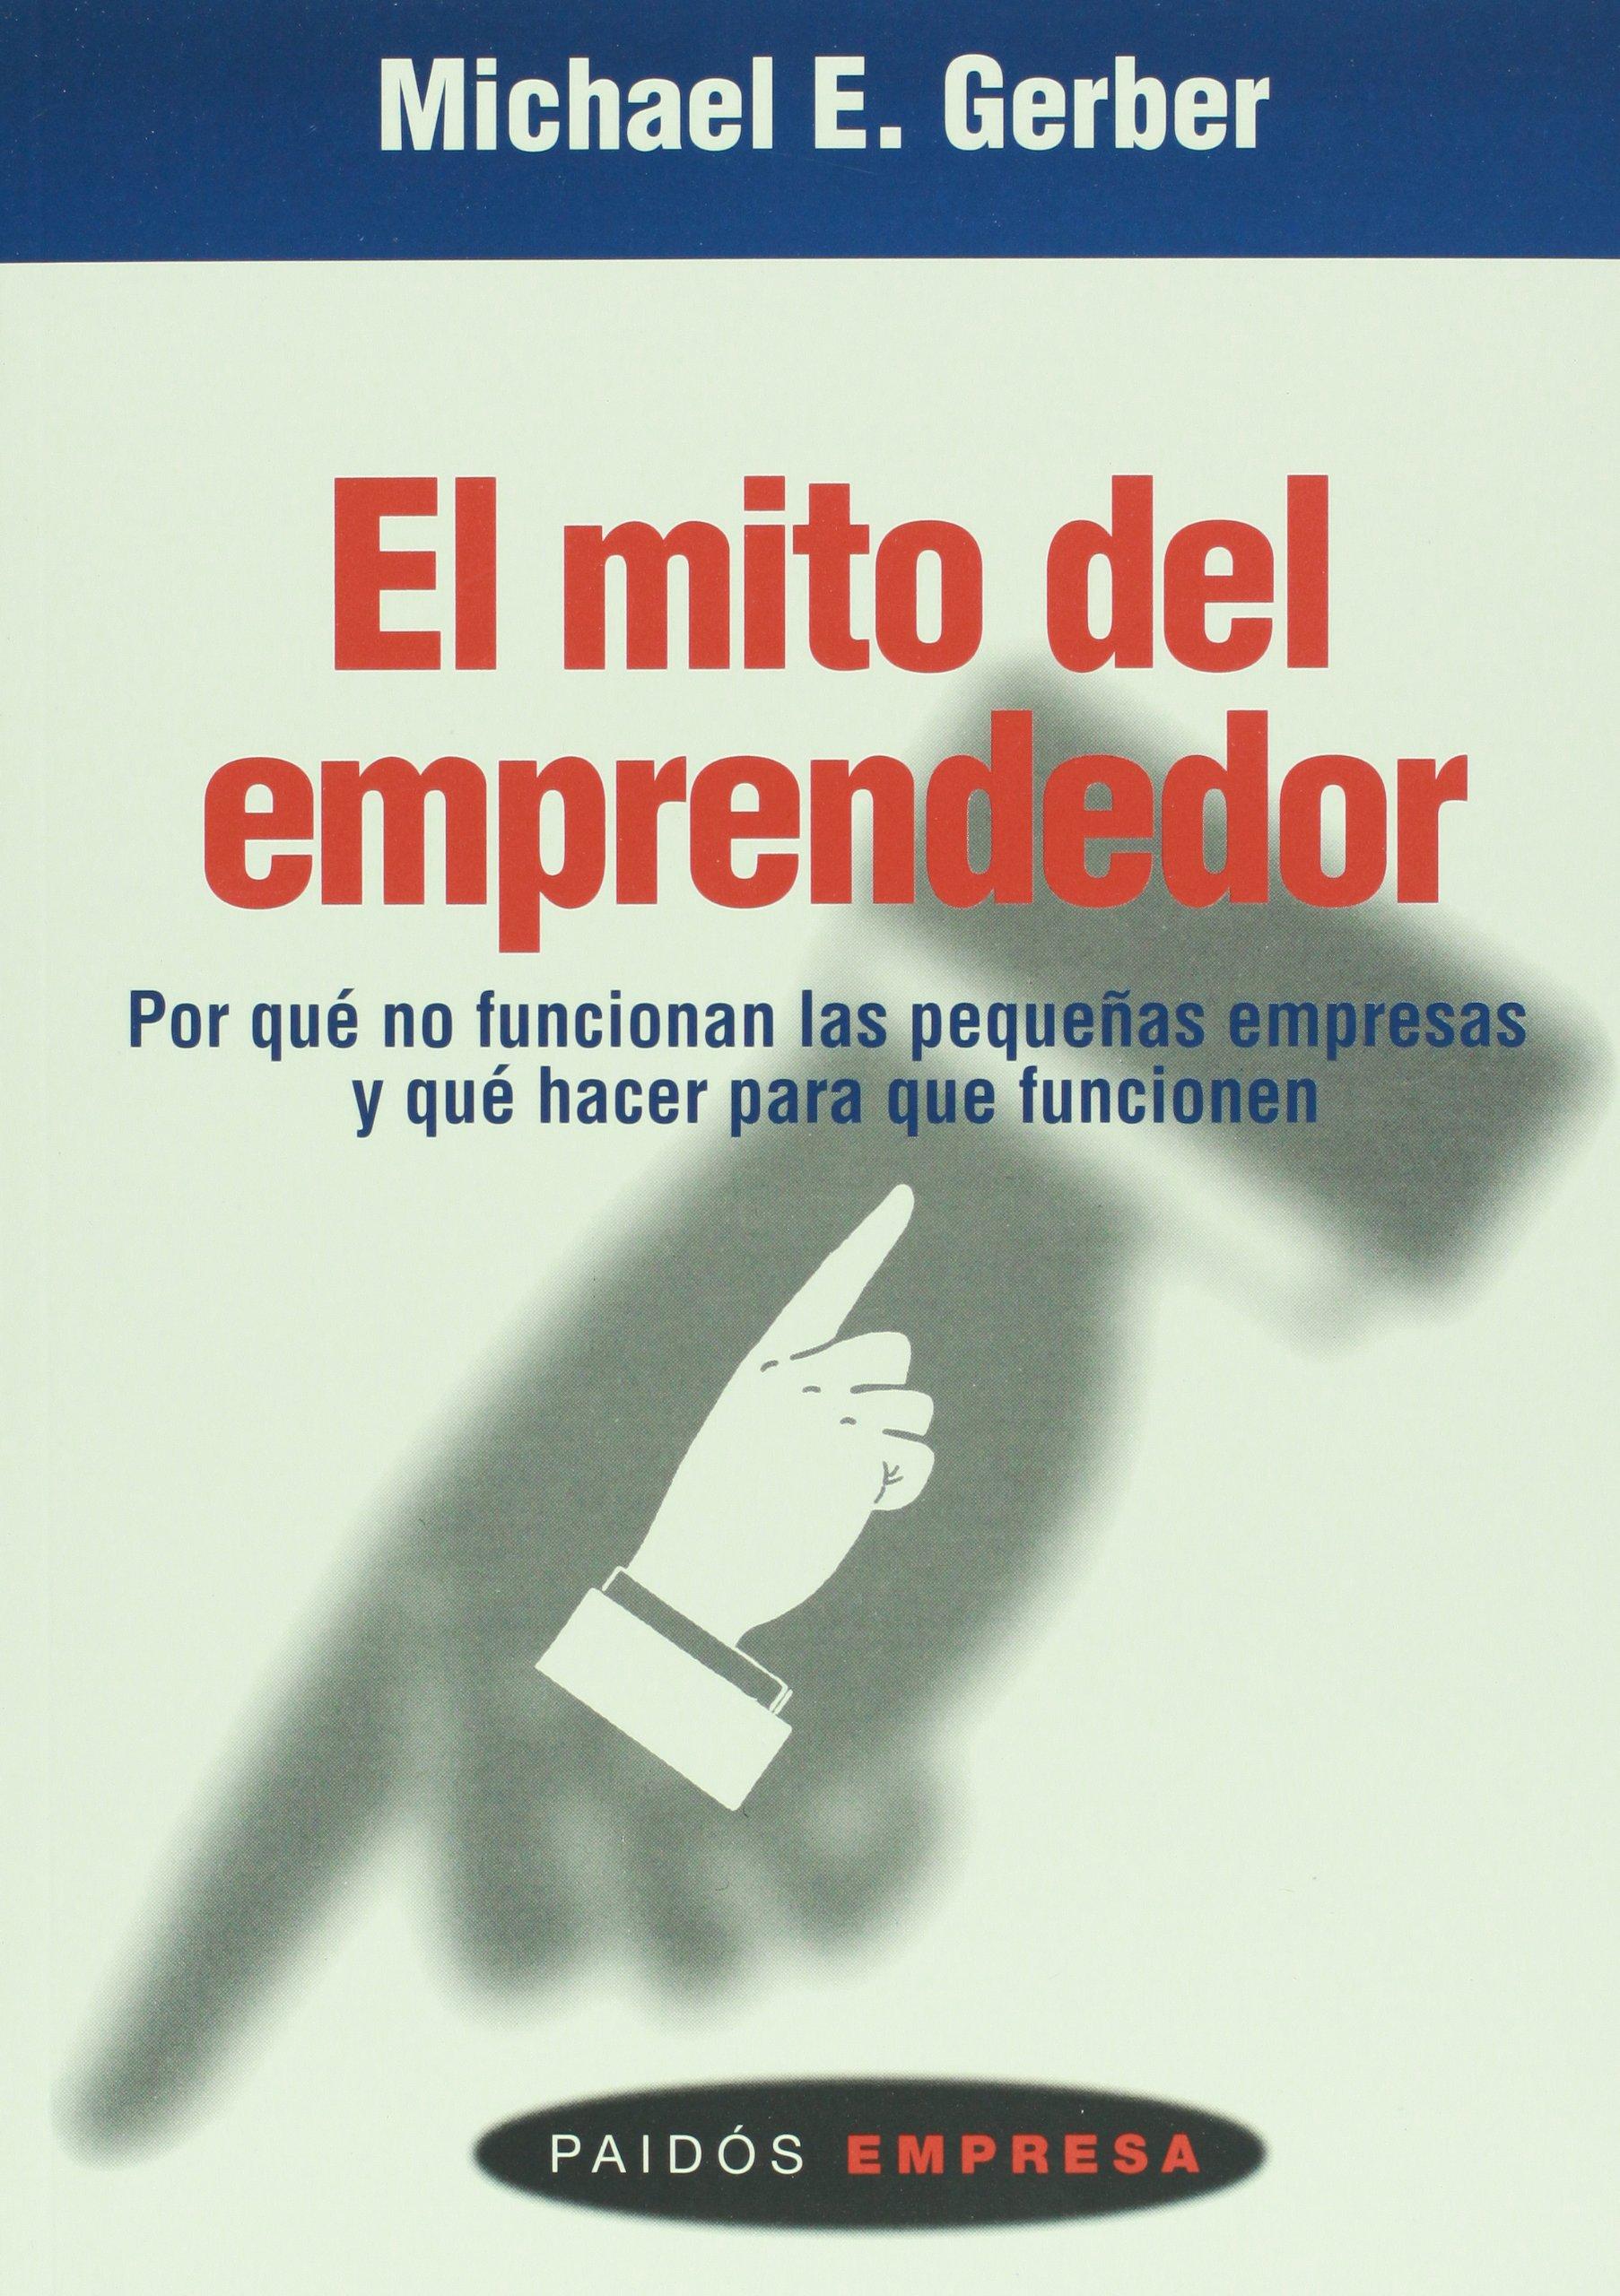 El mito del emprendedor (Spanish Edition): Michael Gerber: 9789688536308:  Amazon.com: Books